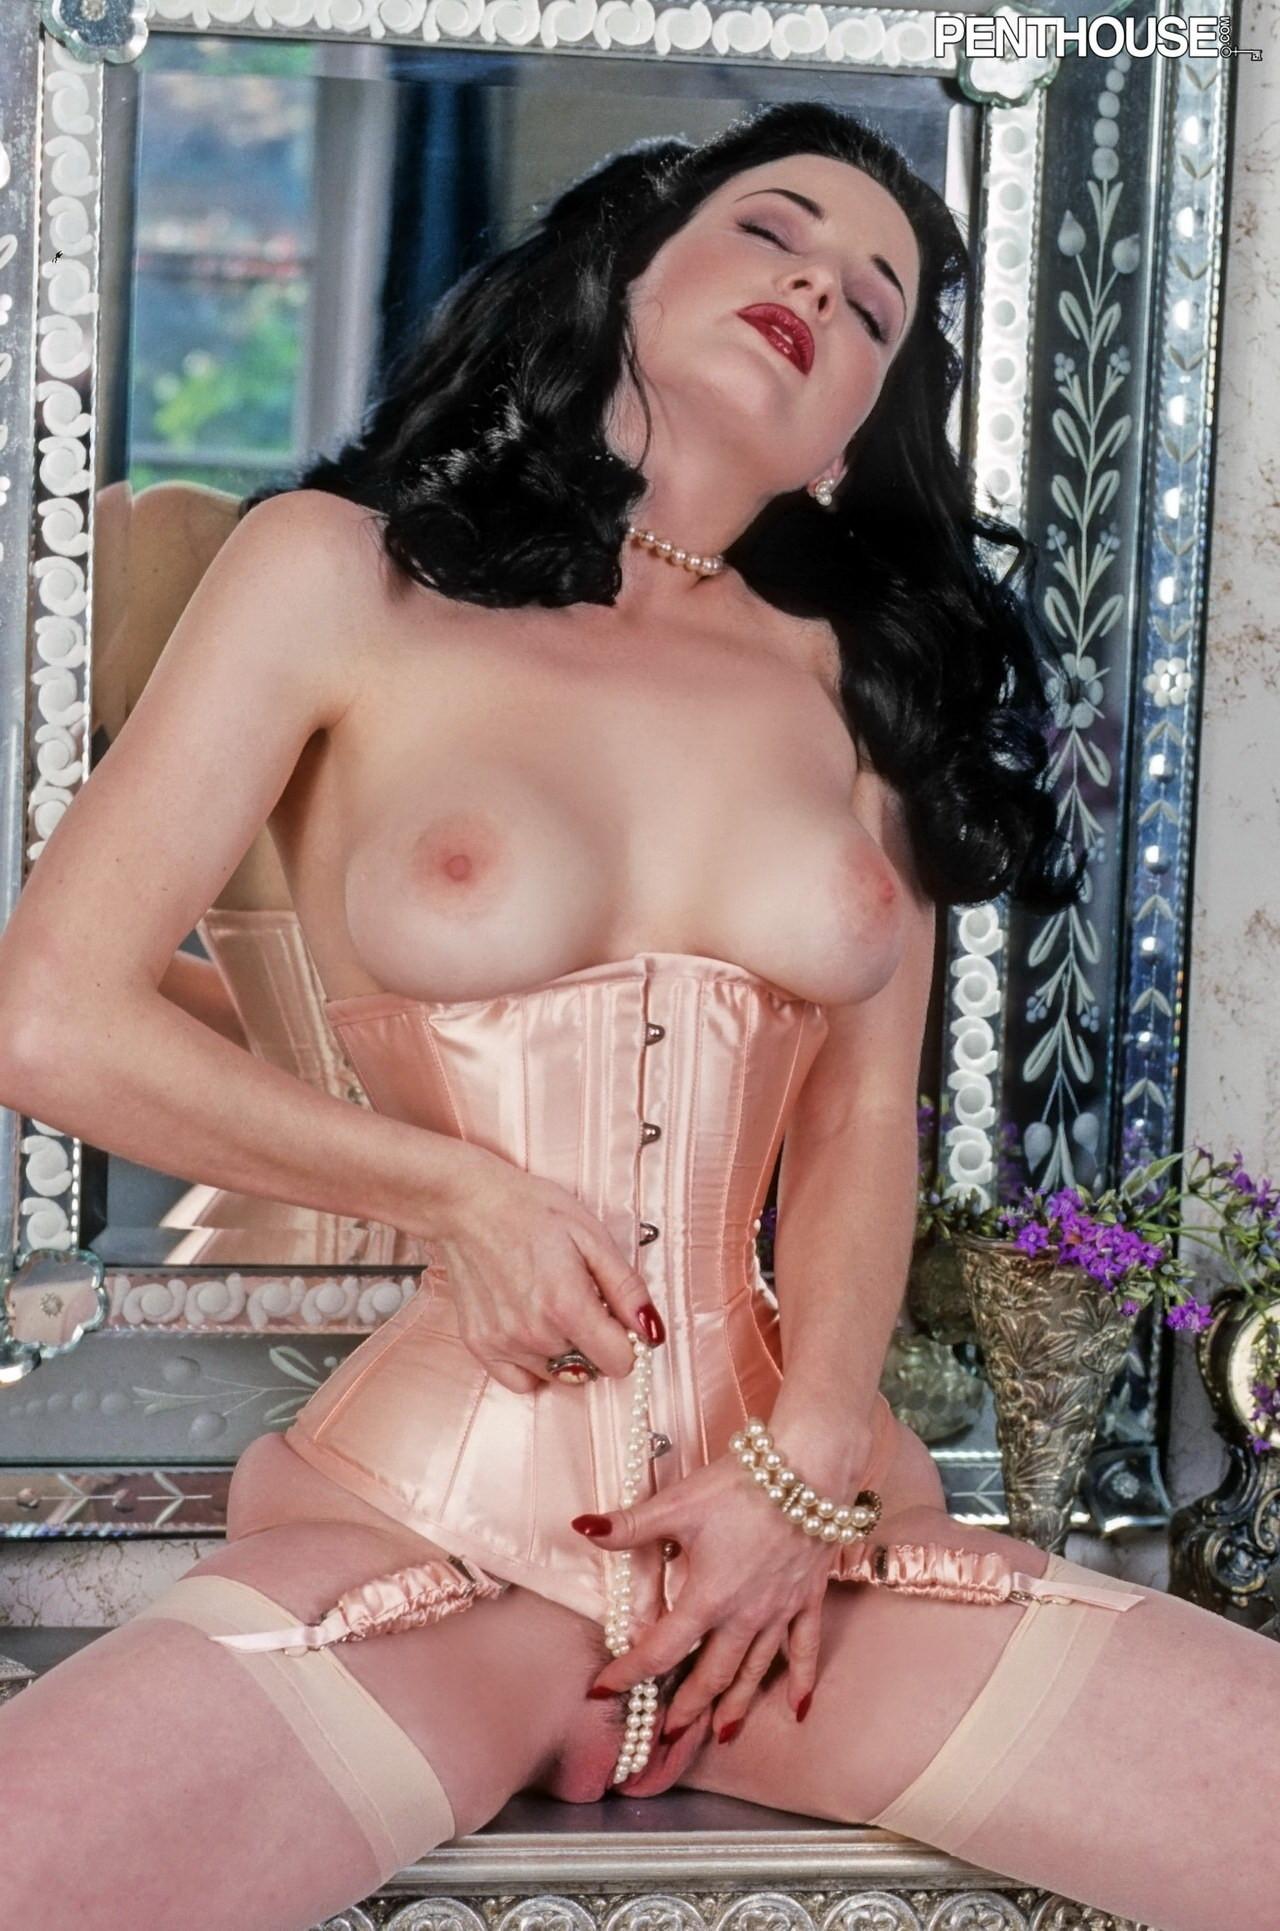 Dita Von Teese Half Nude Touching Pussy